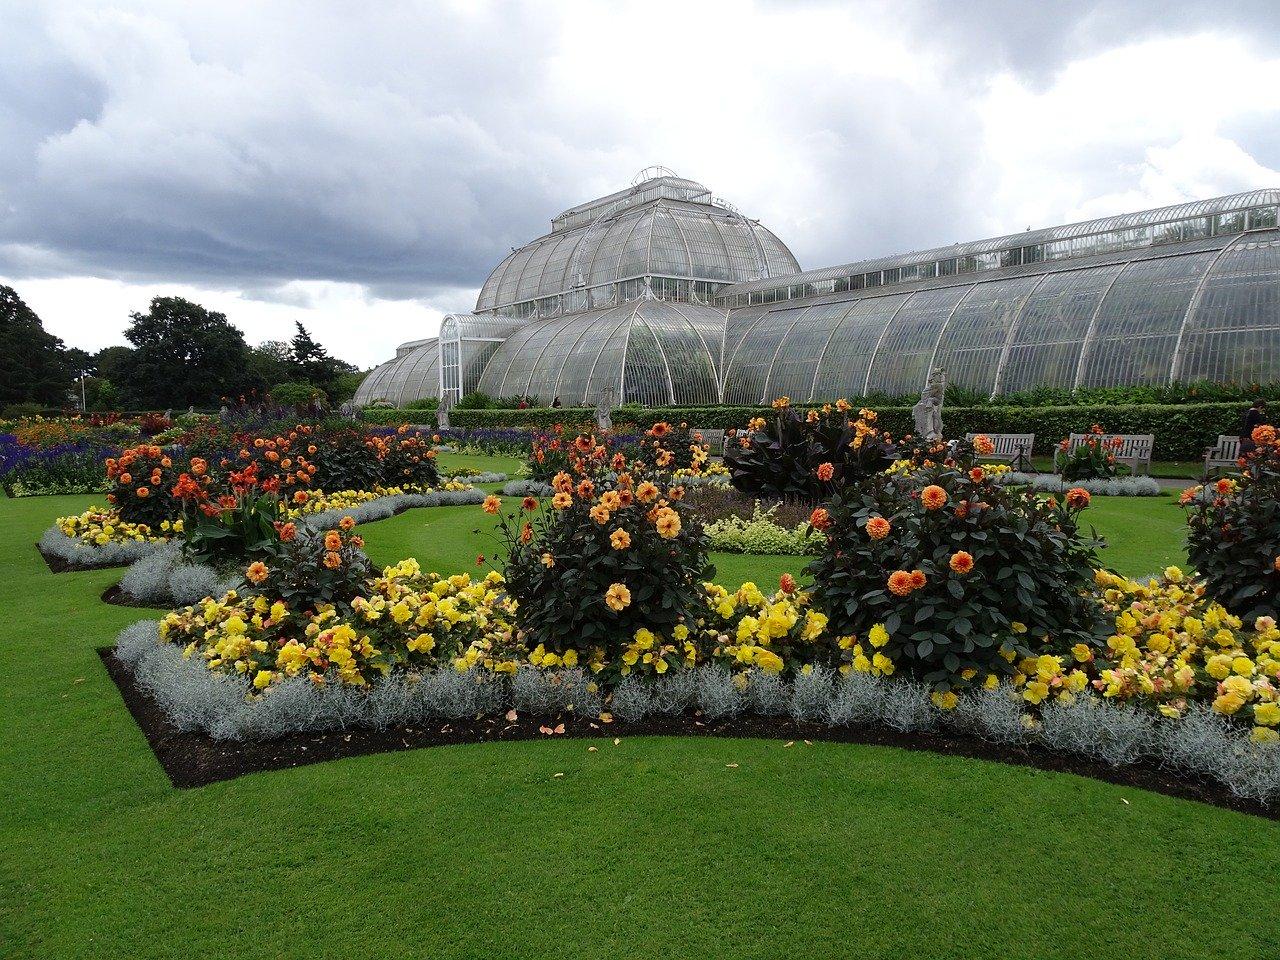 Kew Gardens in London, England.